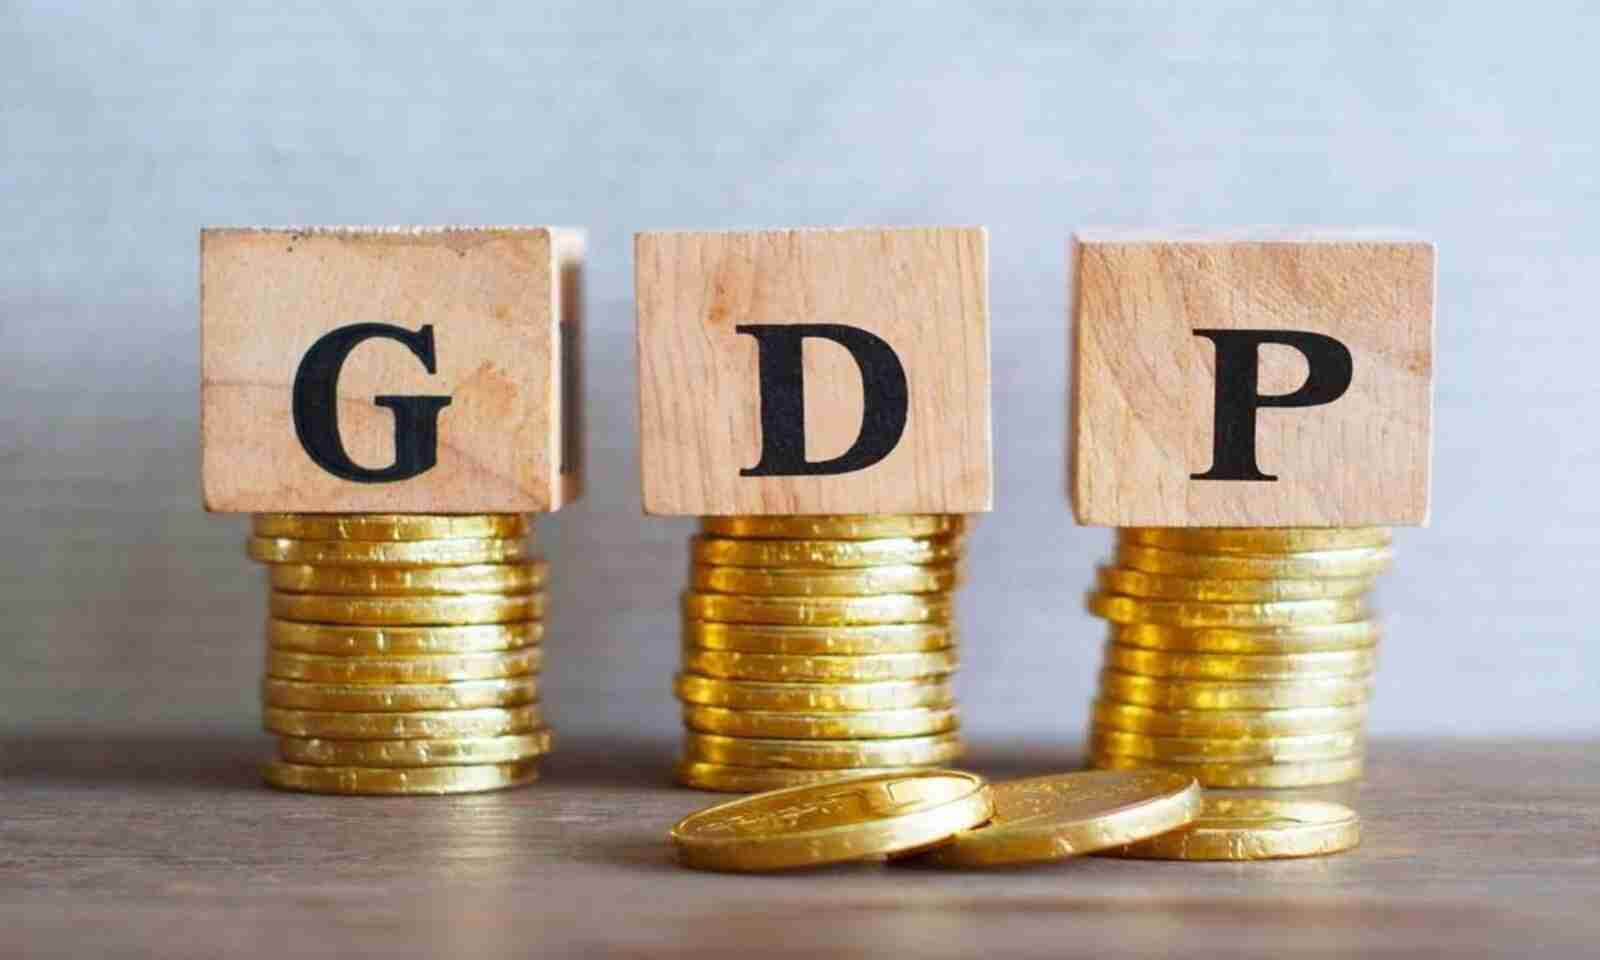 CII projects India's FY22 GDP growth at 9.5% | CII இந்தியாவின் FY22 மொத்த உள்நாட்டு உற்பத்தியின் வளர்ச்சியை 9.5% ஆகக் மதிப்பிட்டுள்ளது |_40.1